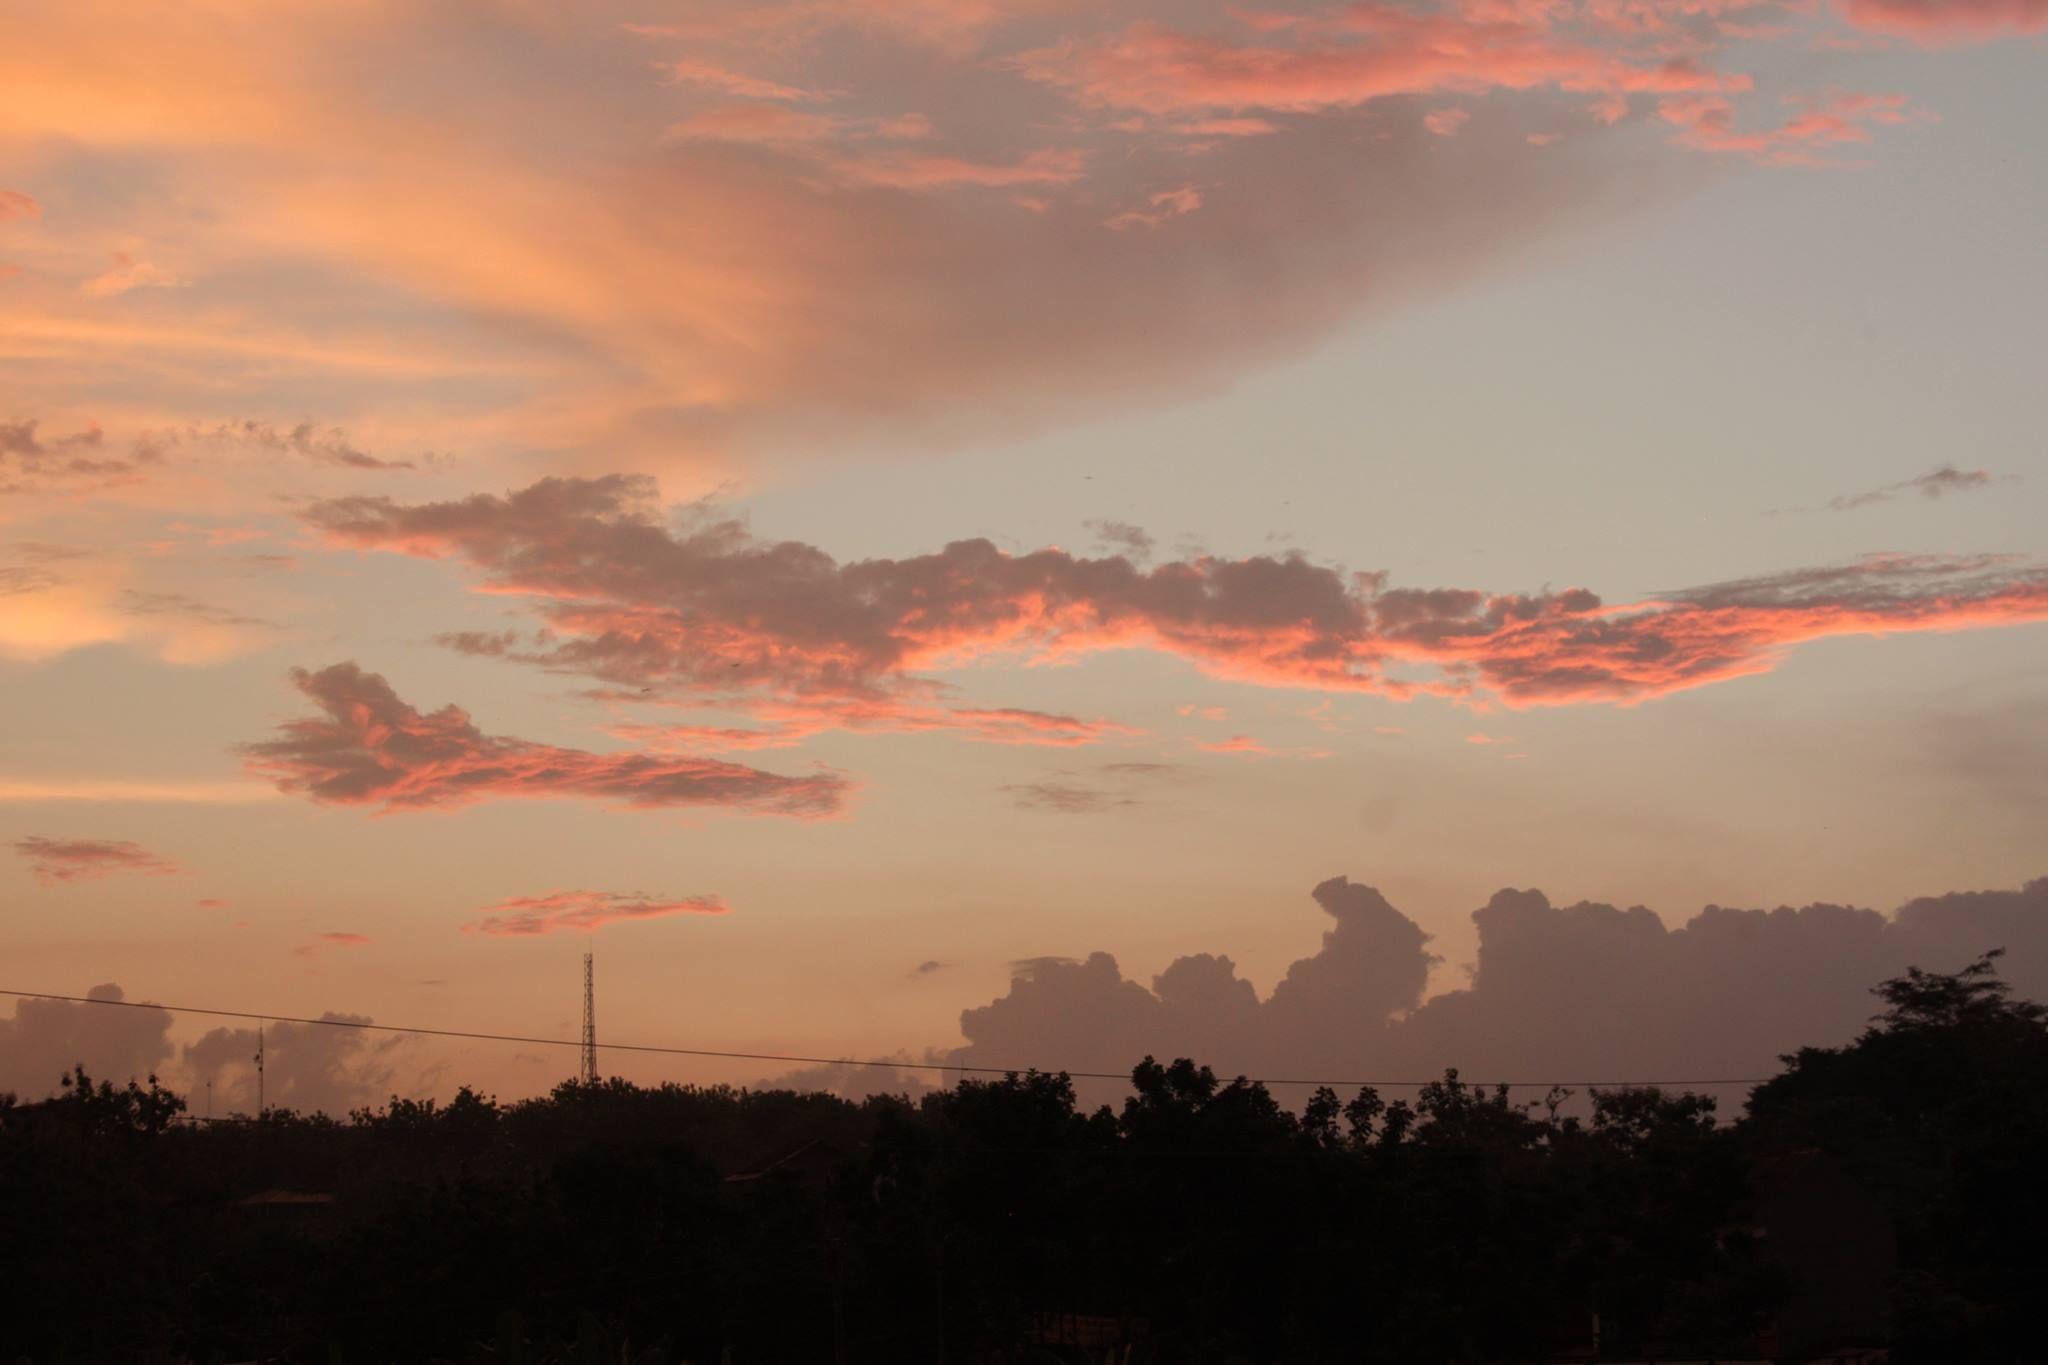 Sore hari di Semarang Langit, Publik, Inspirasi